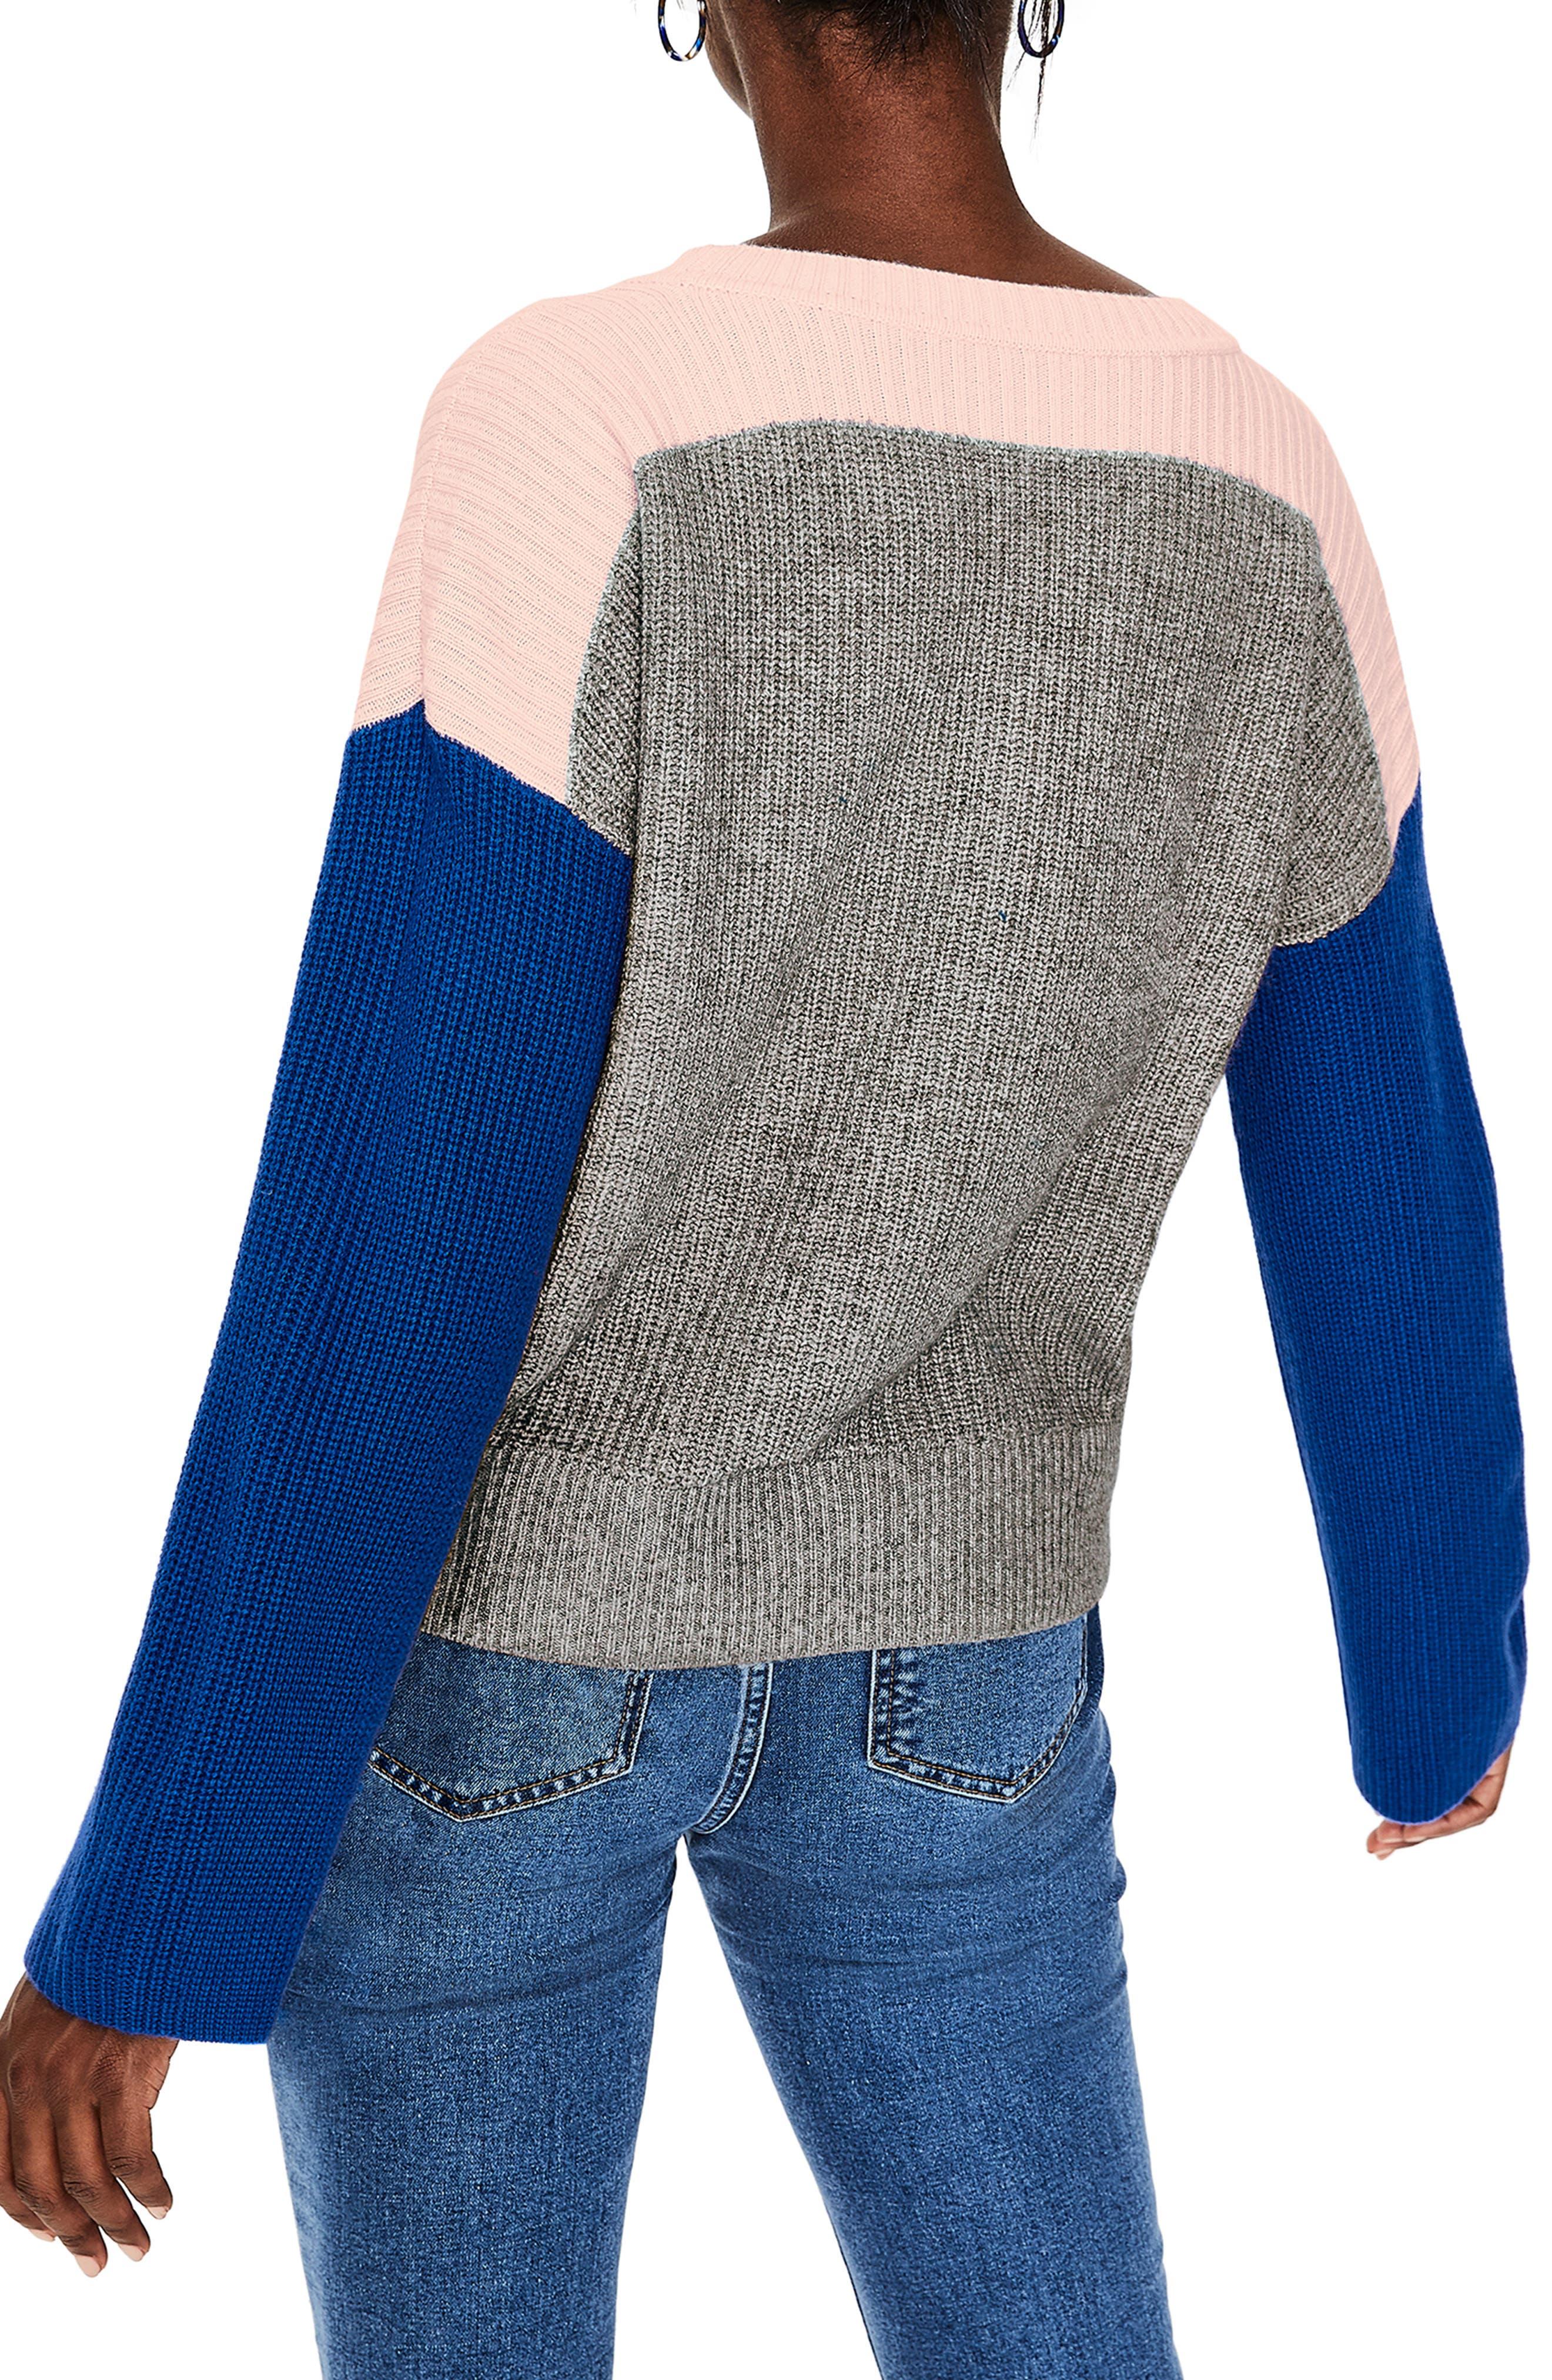 Sophie Colorblock Sweater,                             Alternate thumbnail 2, color,                             GREY MELANGE